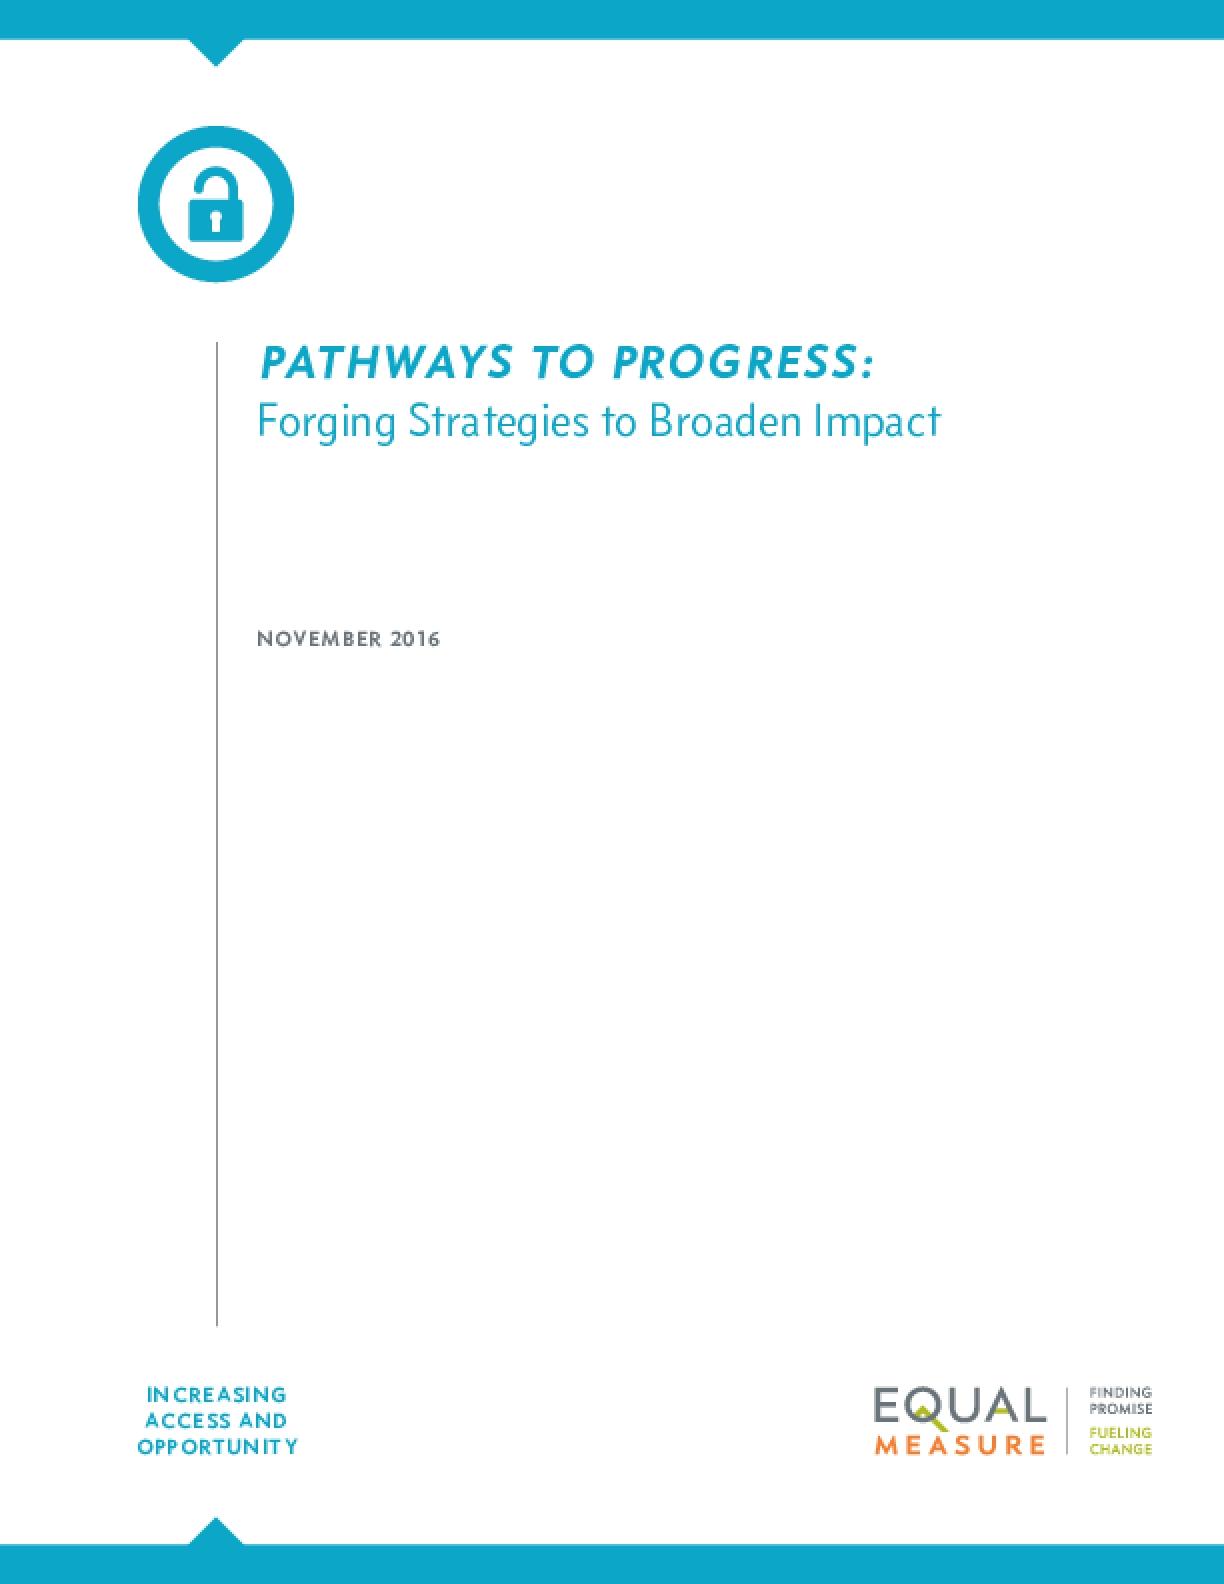 Pathways to Progress: Forging Strategies to Broaden Impact